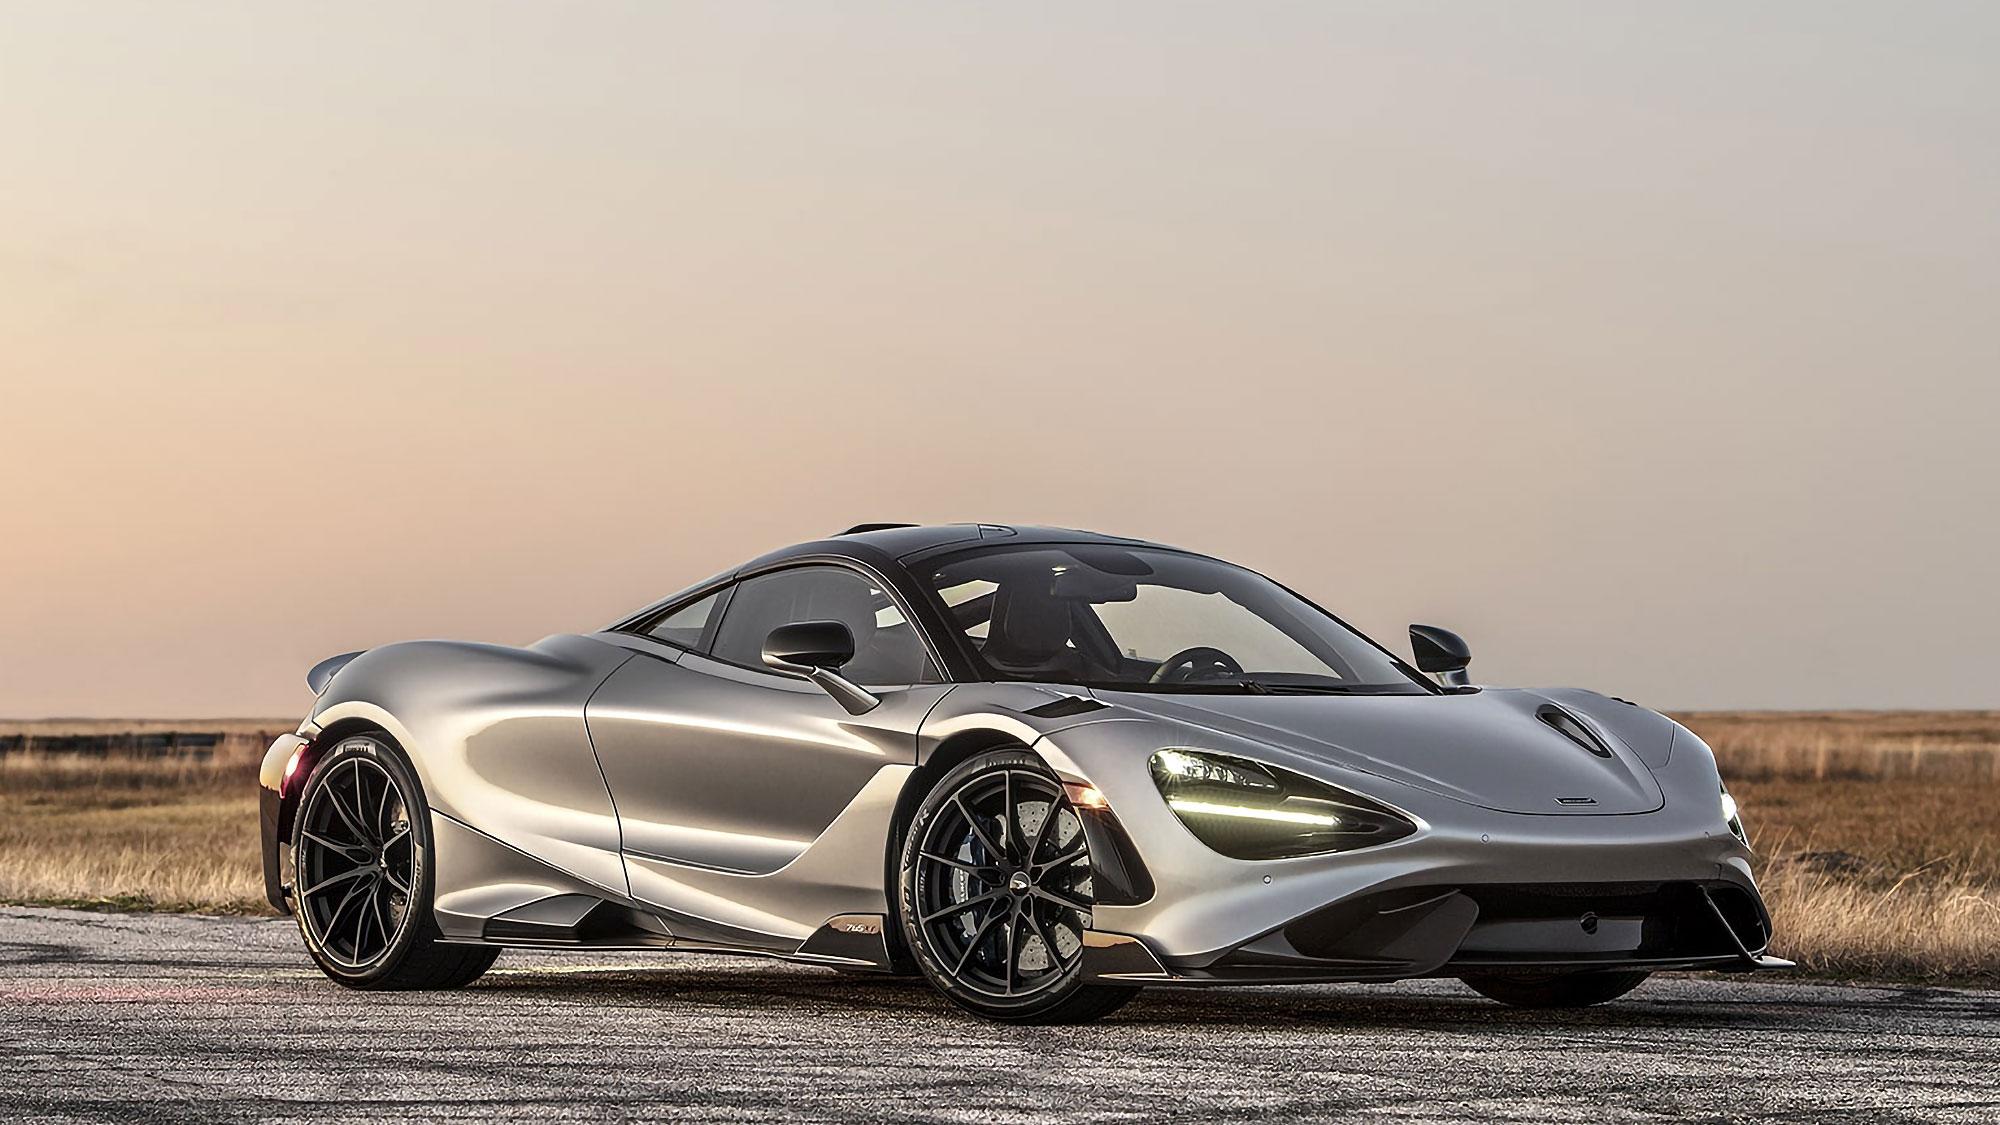 Hennessey HPE1000 Will Boost McLaren 765LT's Power Output To 1,000 Horsepower